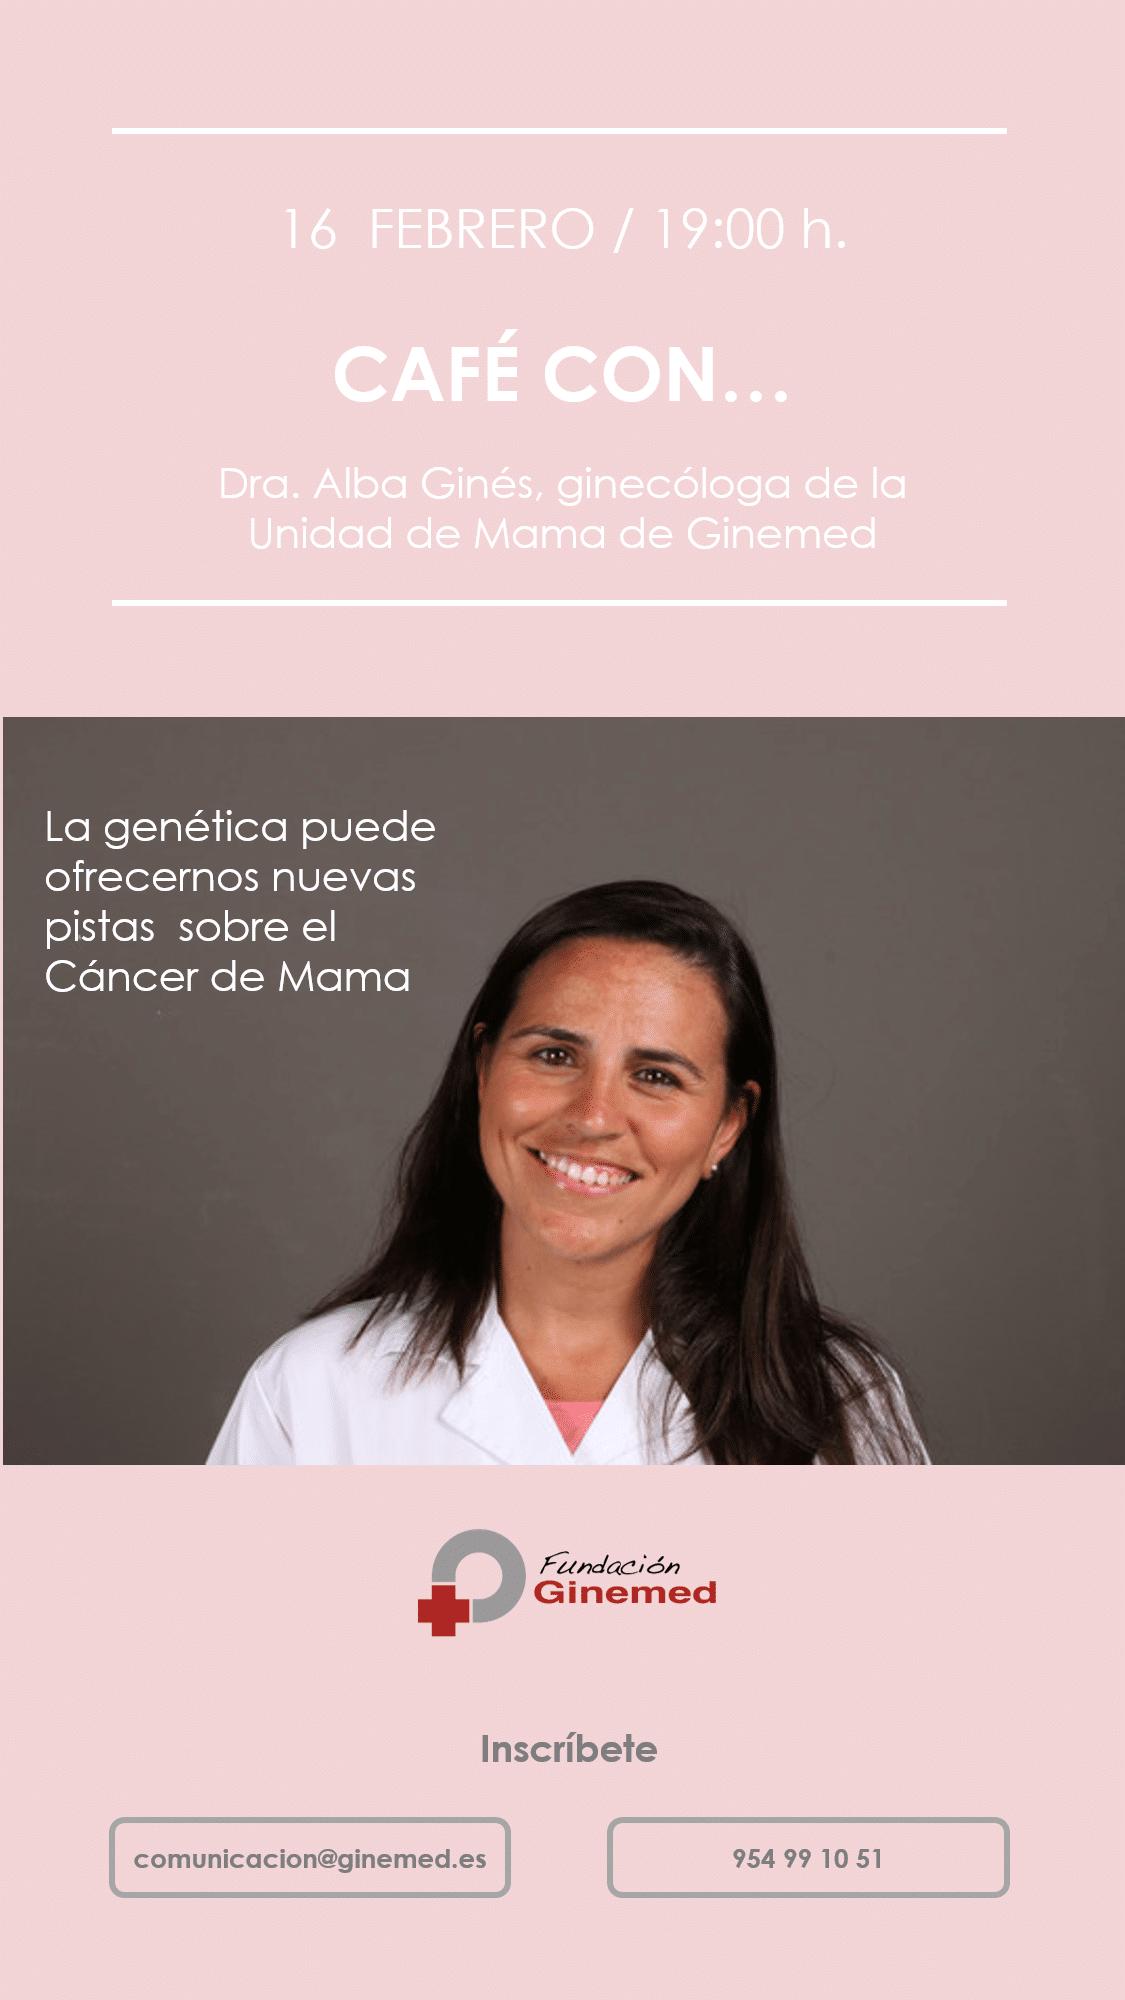 Cartel café con Dra. Alba Ginés, ginecóloga de la unidad de mama de ginemed